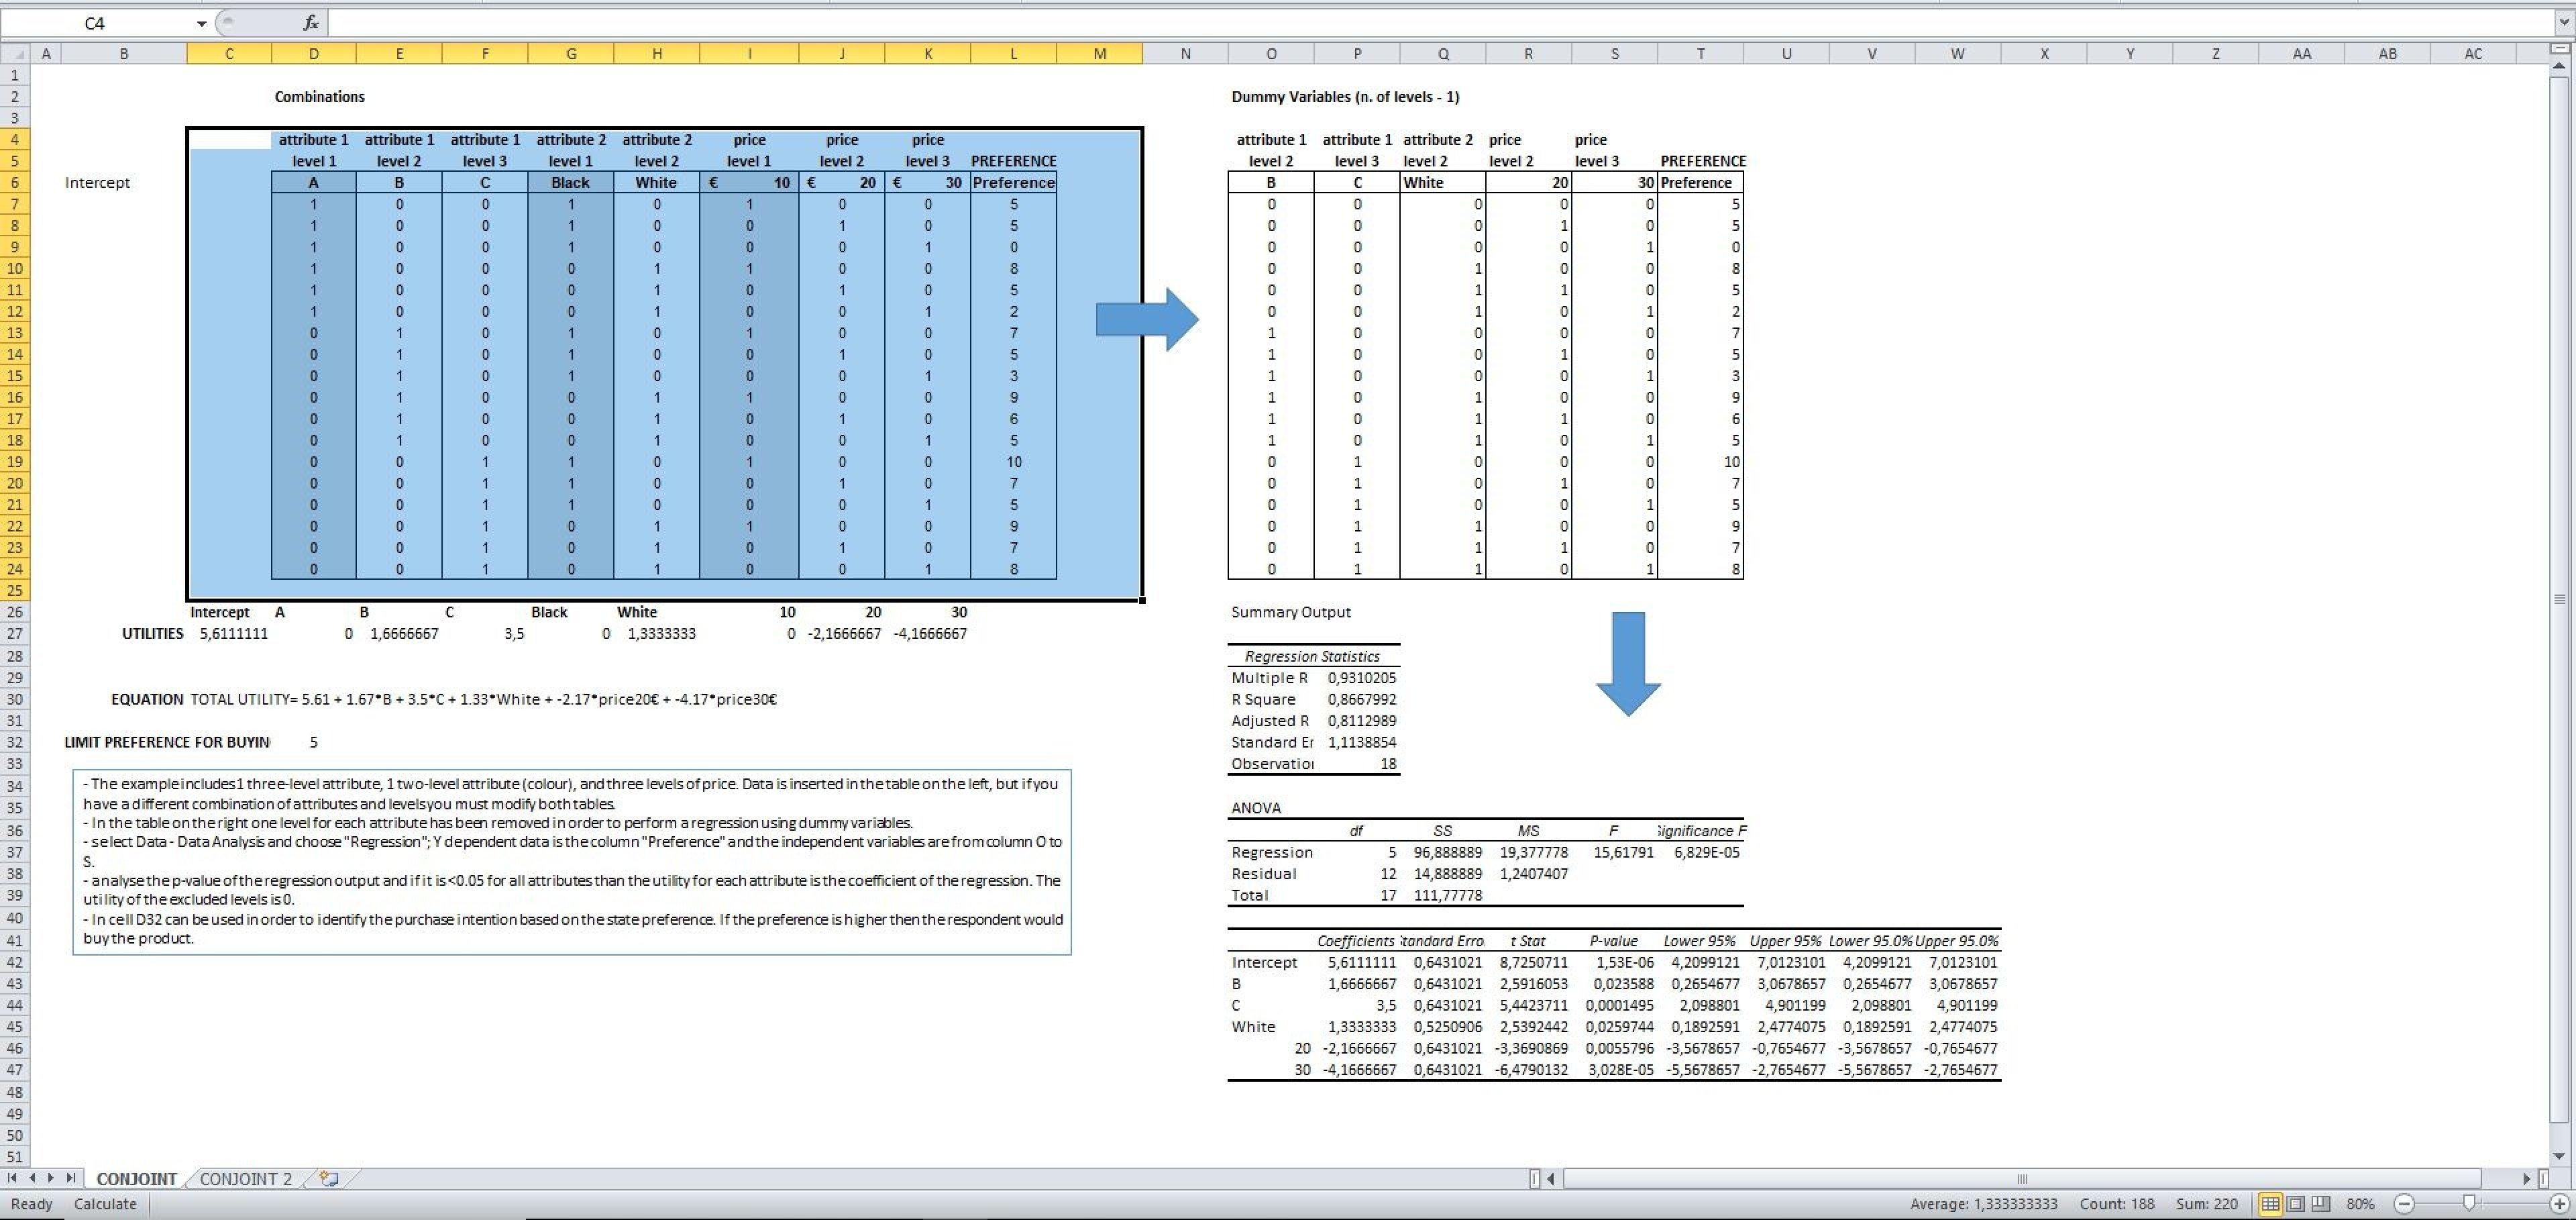 Template For Market Research Excel Spreadsheet Intended For Market Research Excel Spreadsheet In Workshhet